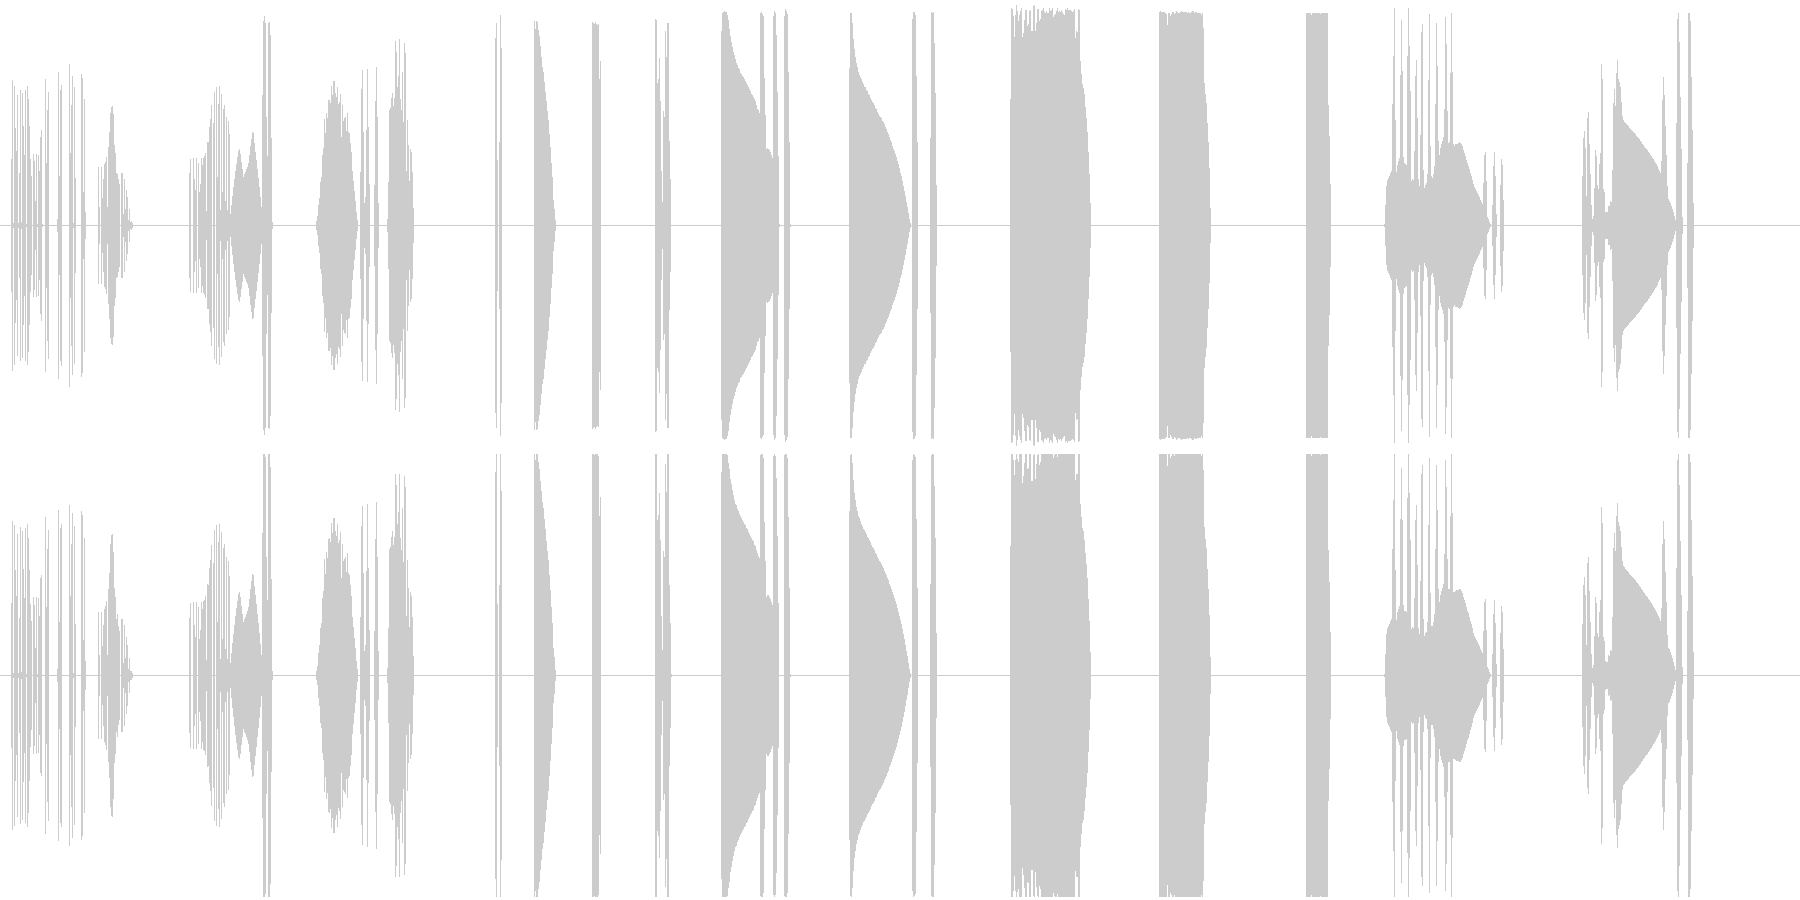 【SFなコンピュータ操作とピコピコ音】の未再生の波形